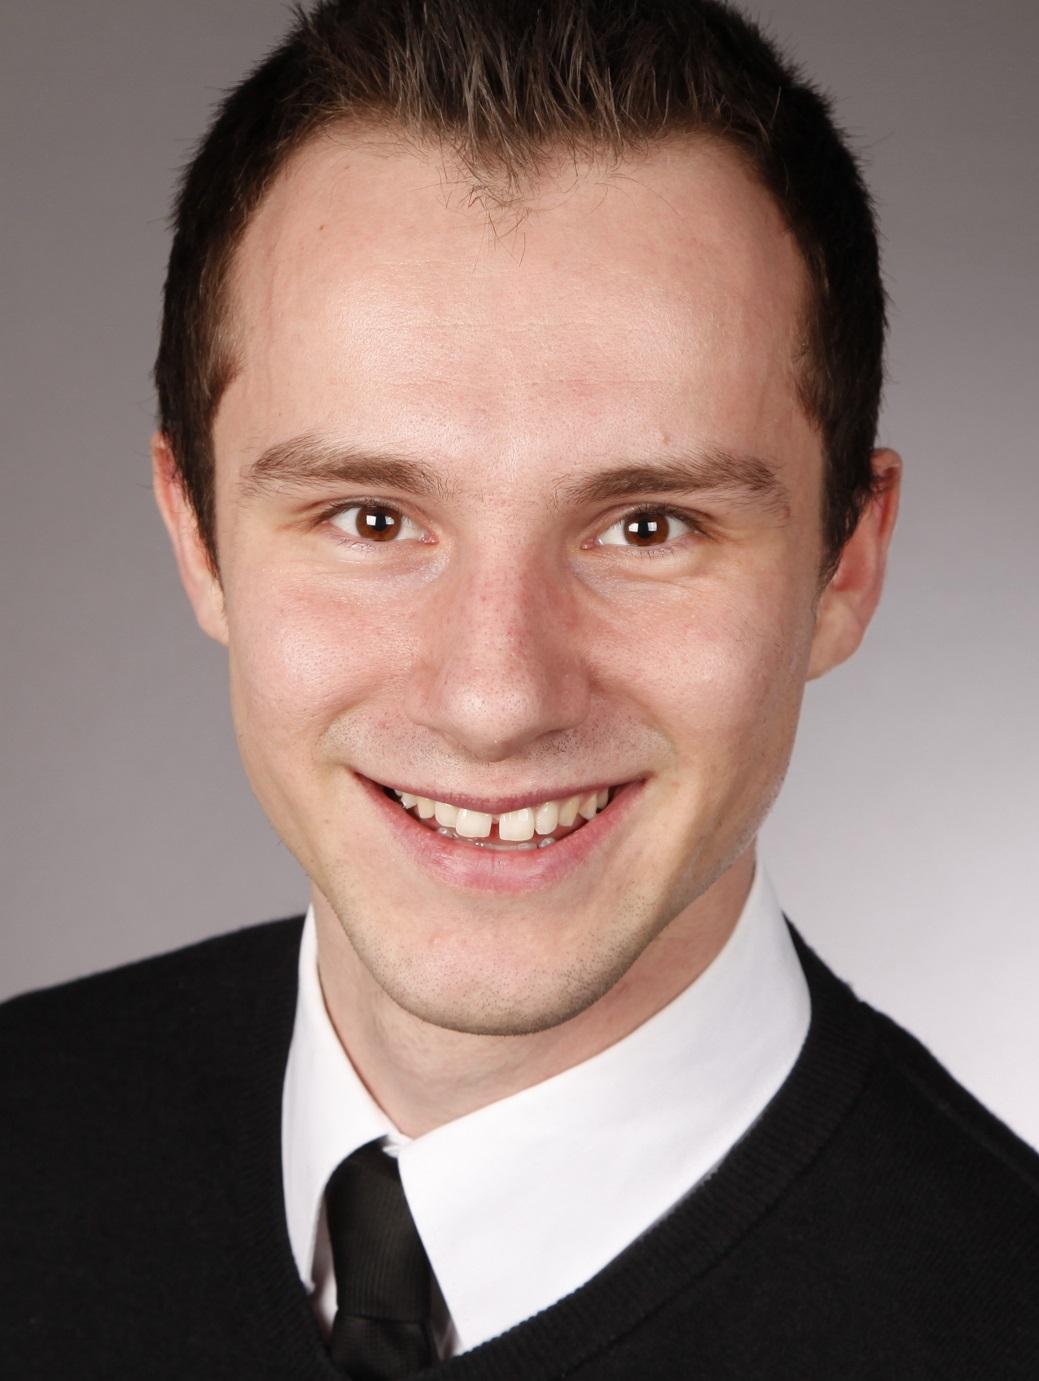 Fabian Heinen